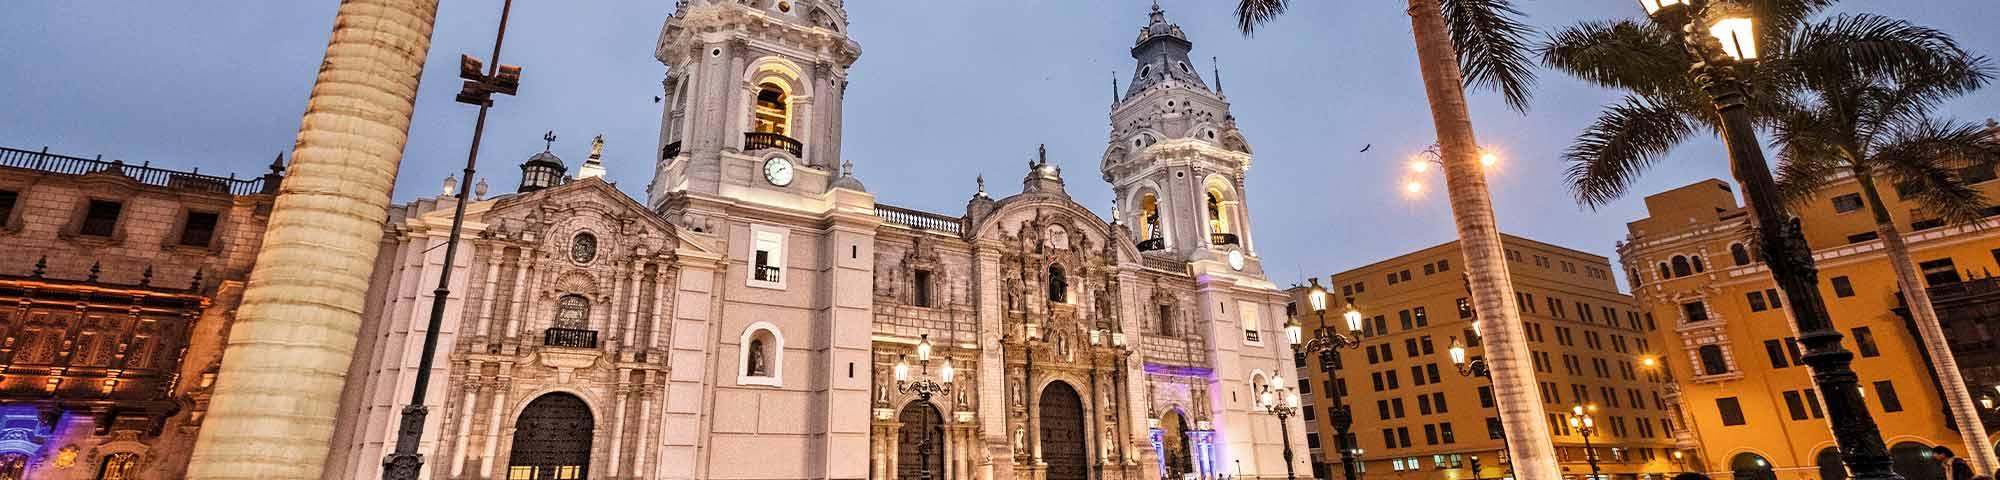 Mincetur entrega Sello Safe Travels a destino turístico Lima